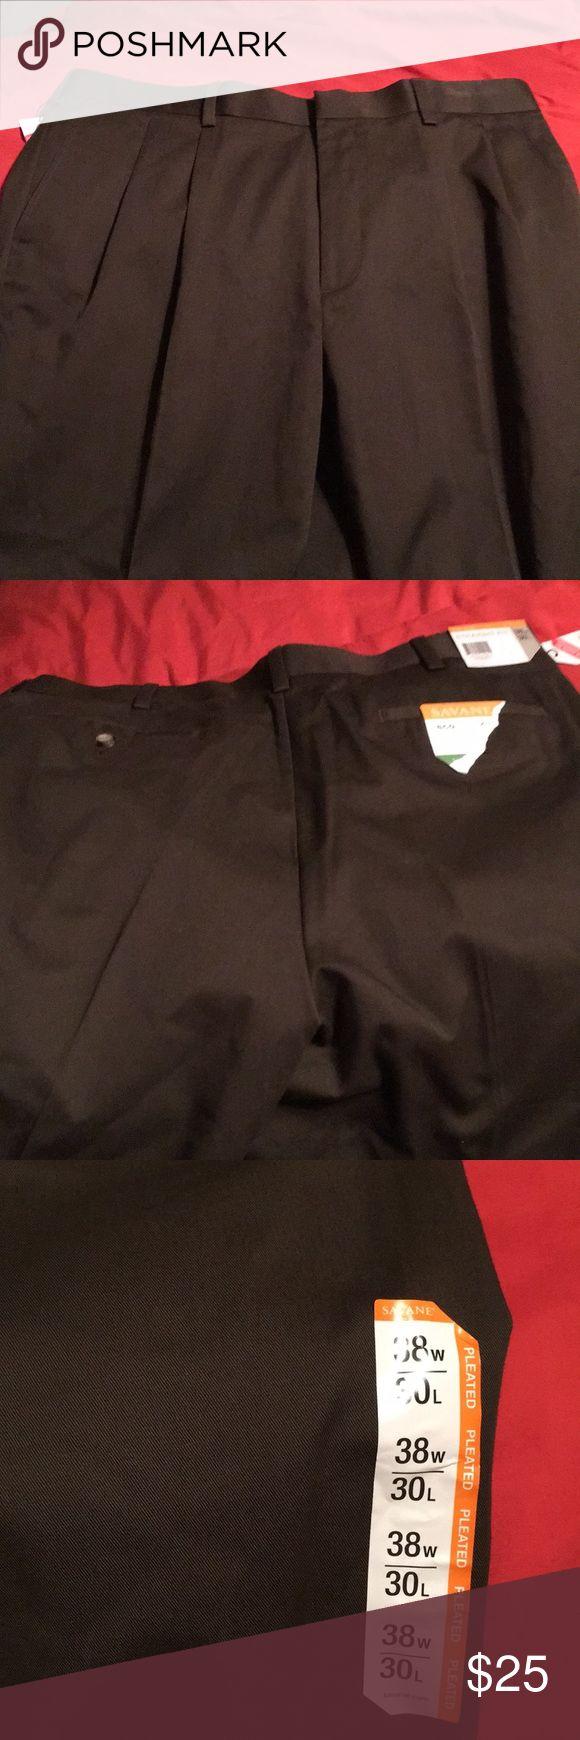 Men's Wrinkle resistant pants/ permanent crease Men's wrinkle resistant pants with a permanent crease size 38/30 savane Pants Dress